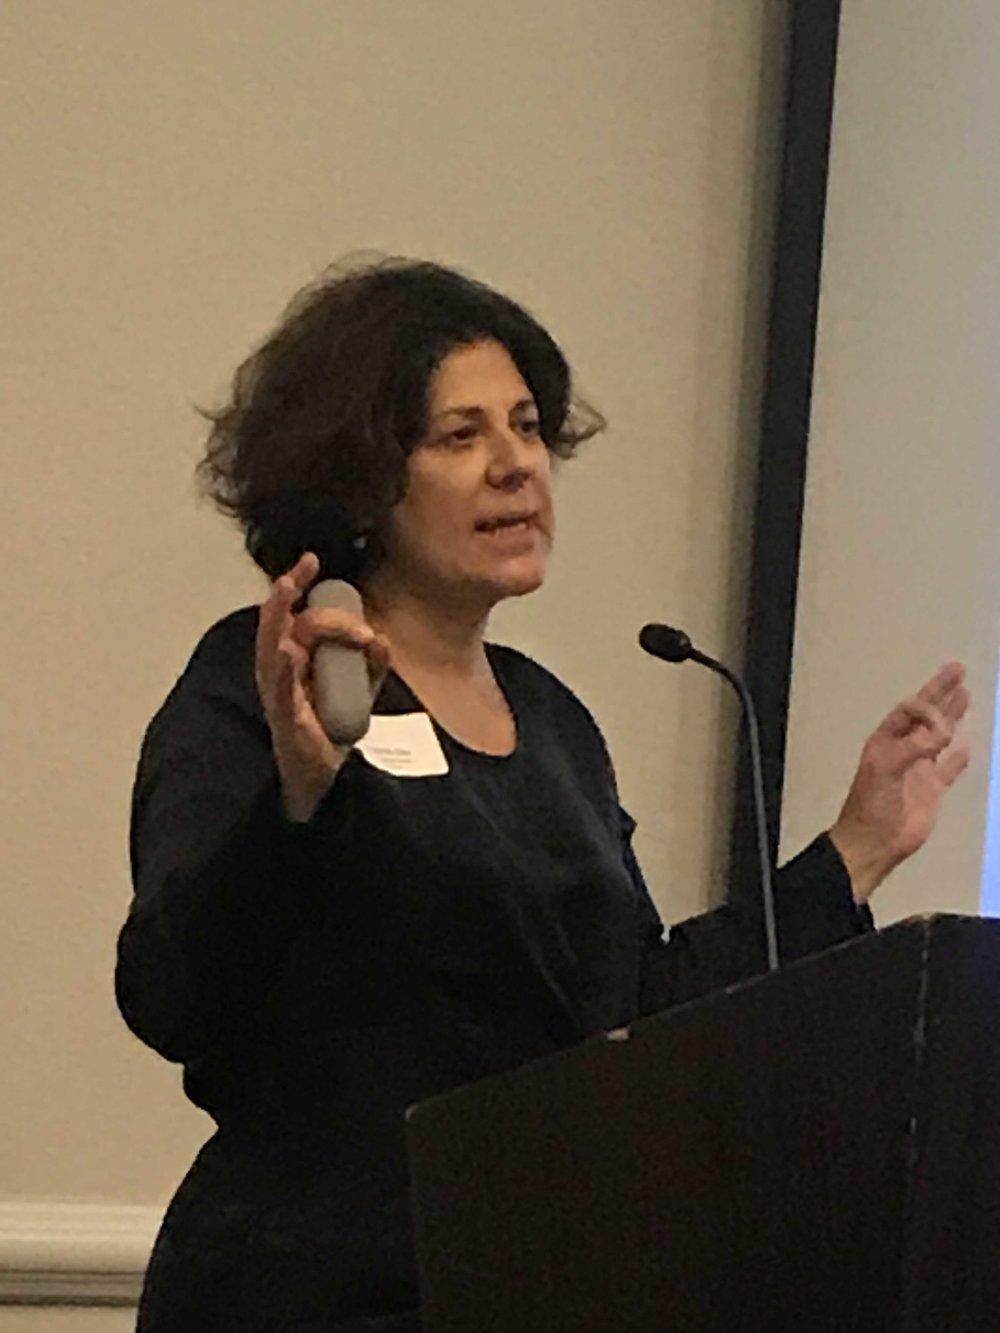 Dr. Roberta Cilio - MD, PhD Univ. of Louvain